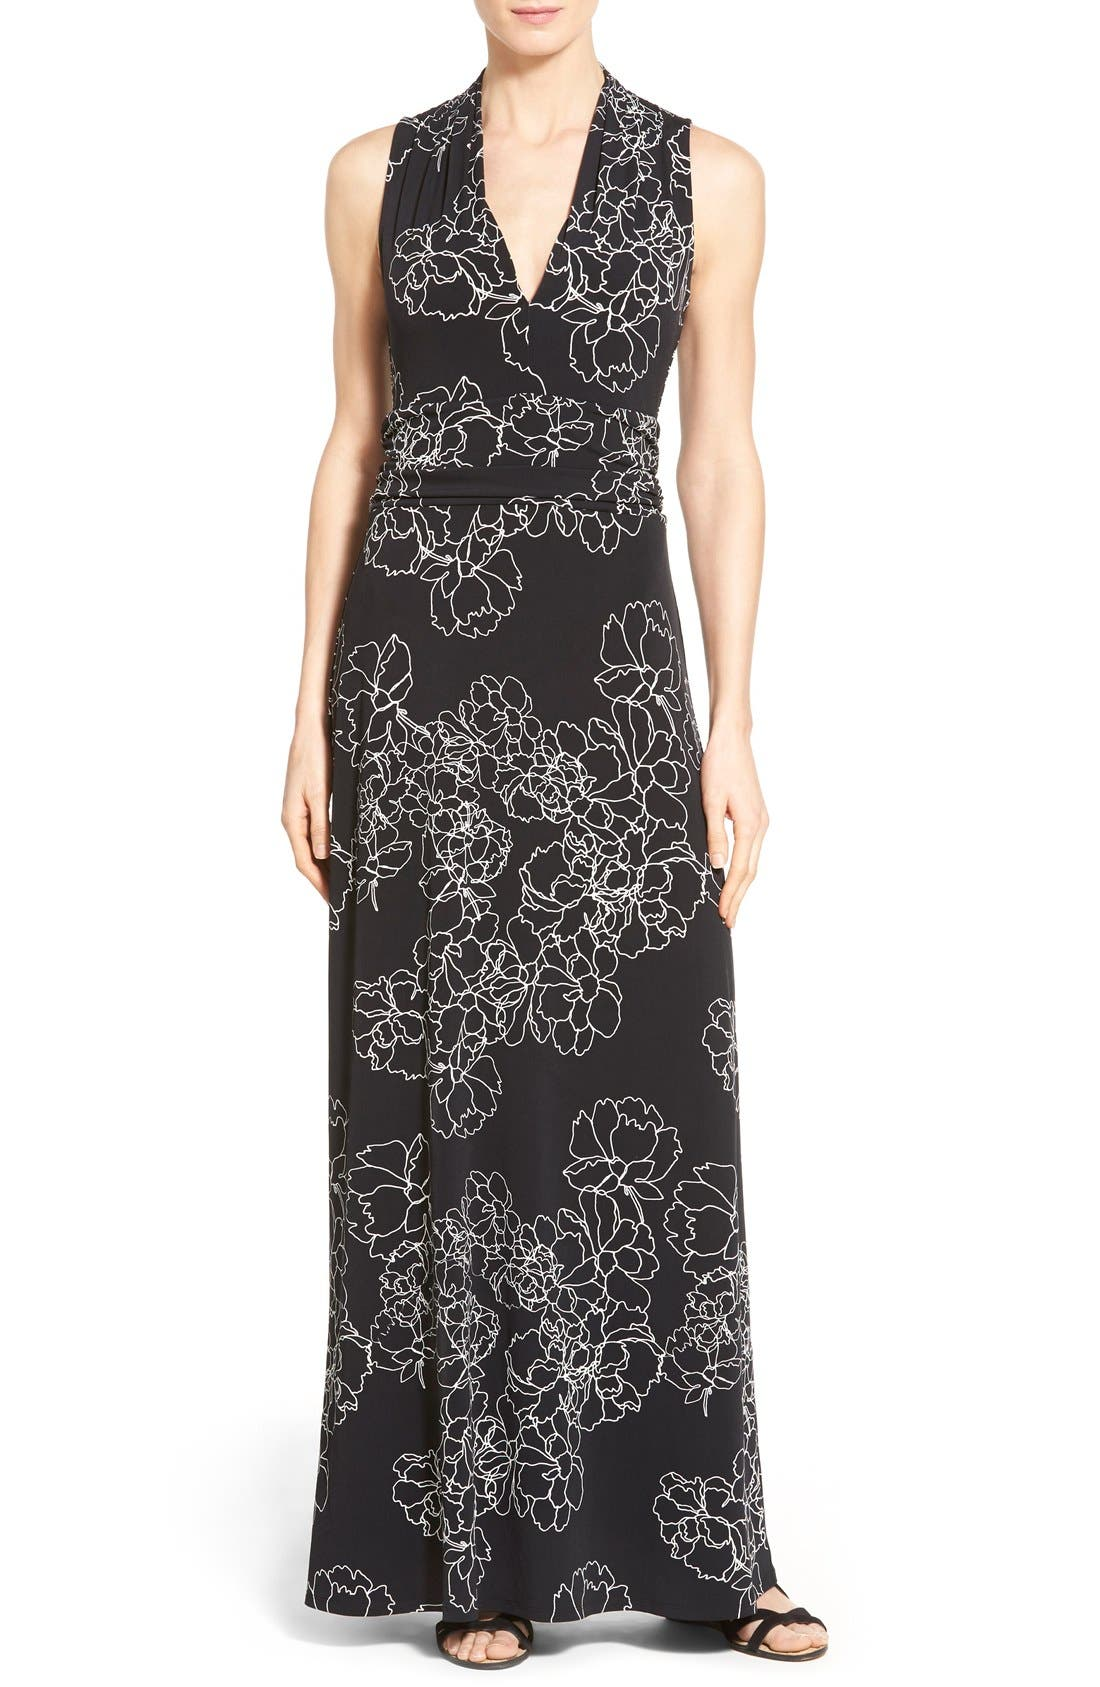 Alternate Image 1 Selected - Vince Camuto Floral Print Jersey Maxi Dress (Regular & Petite)